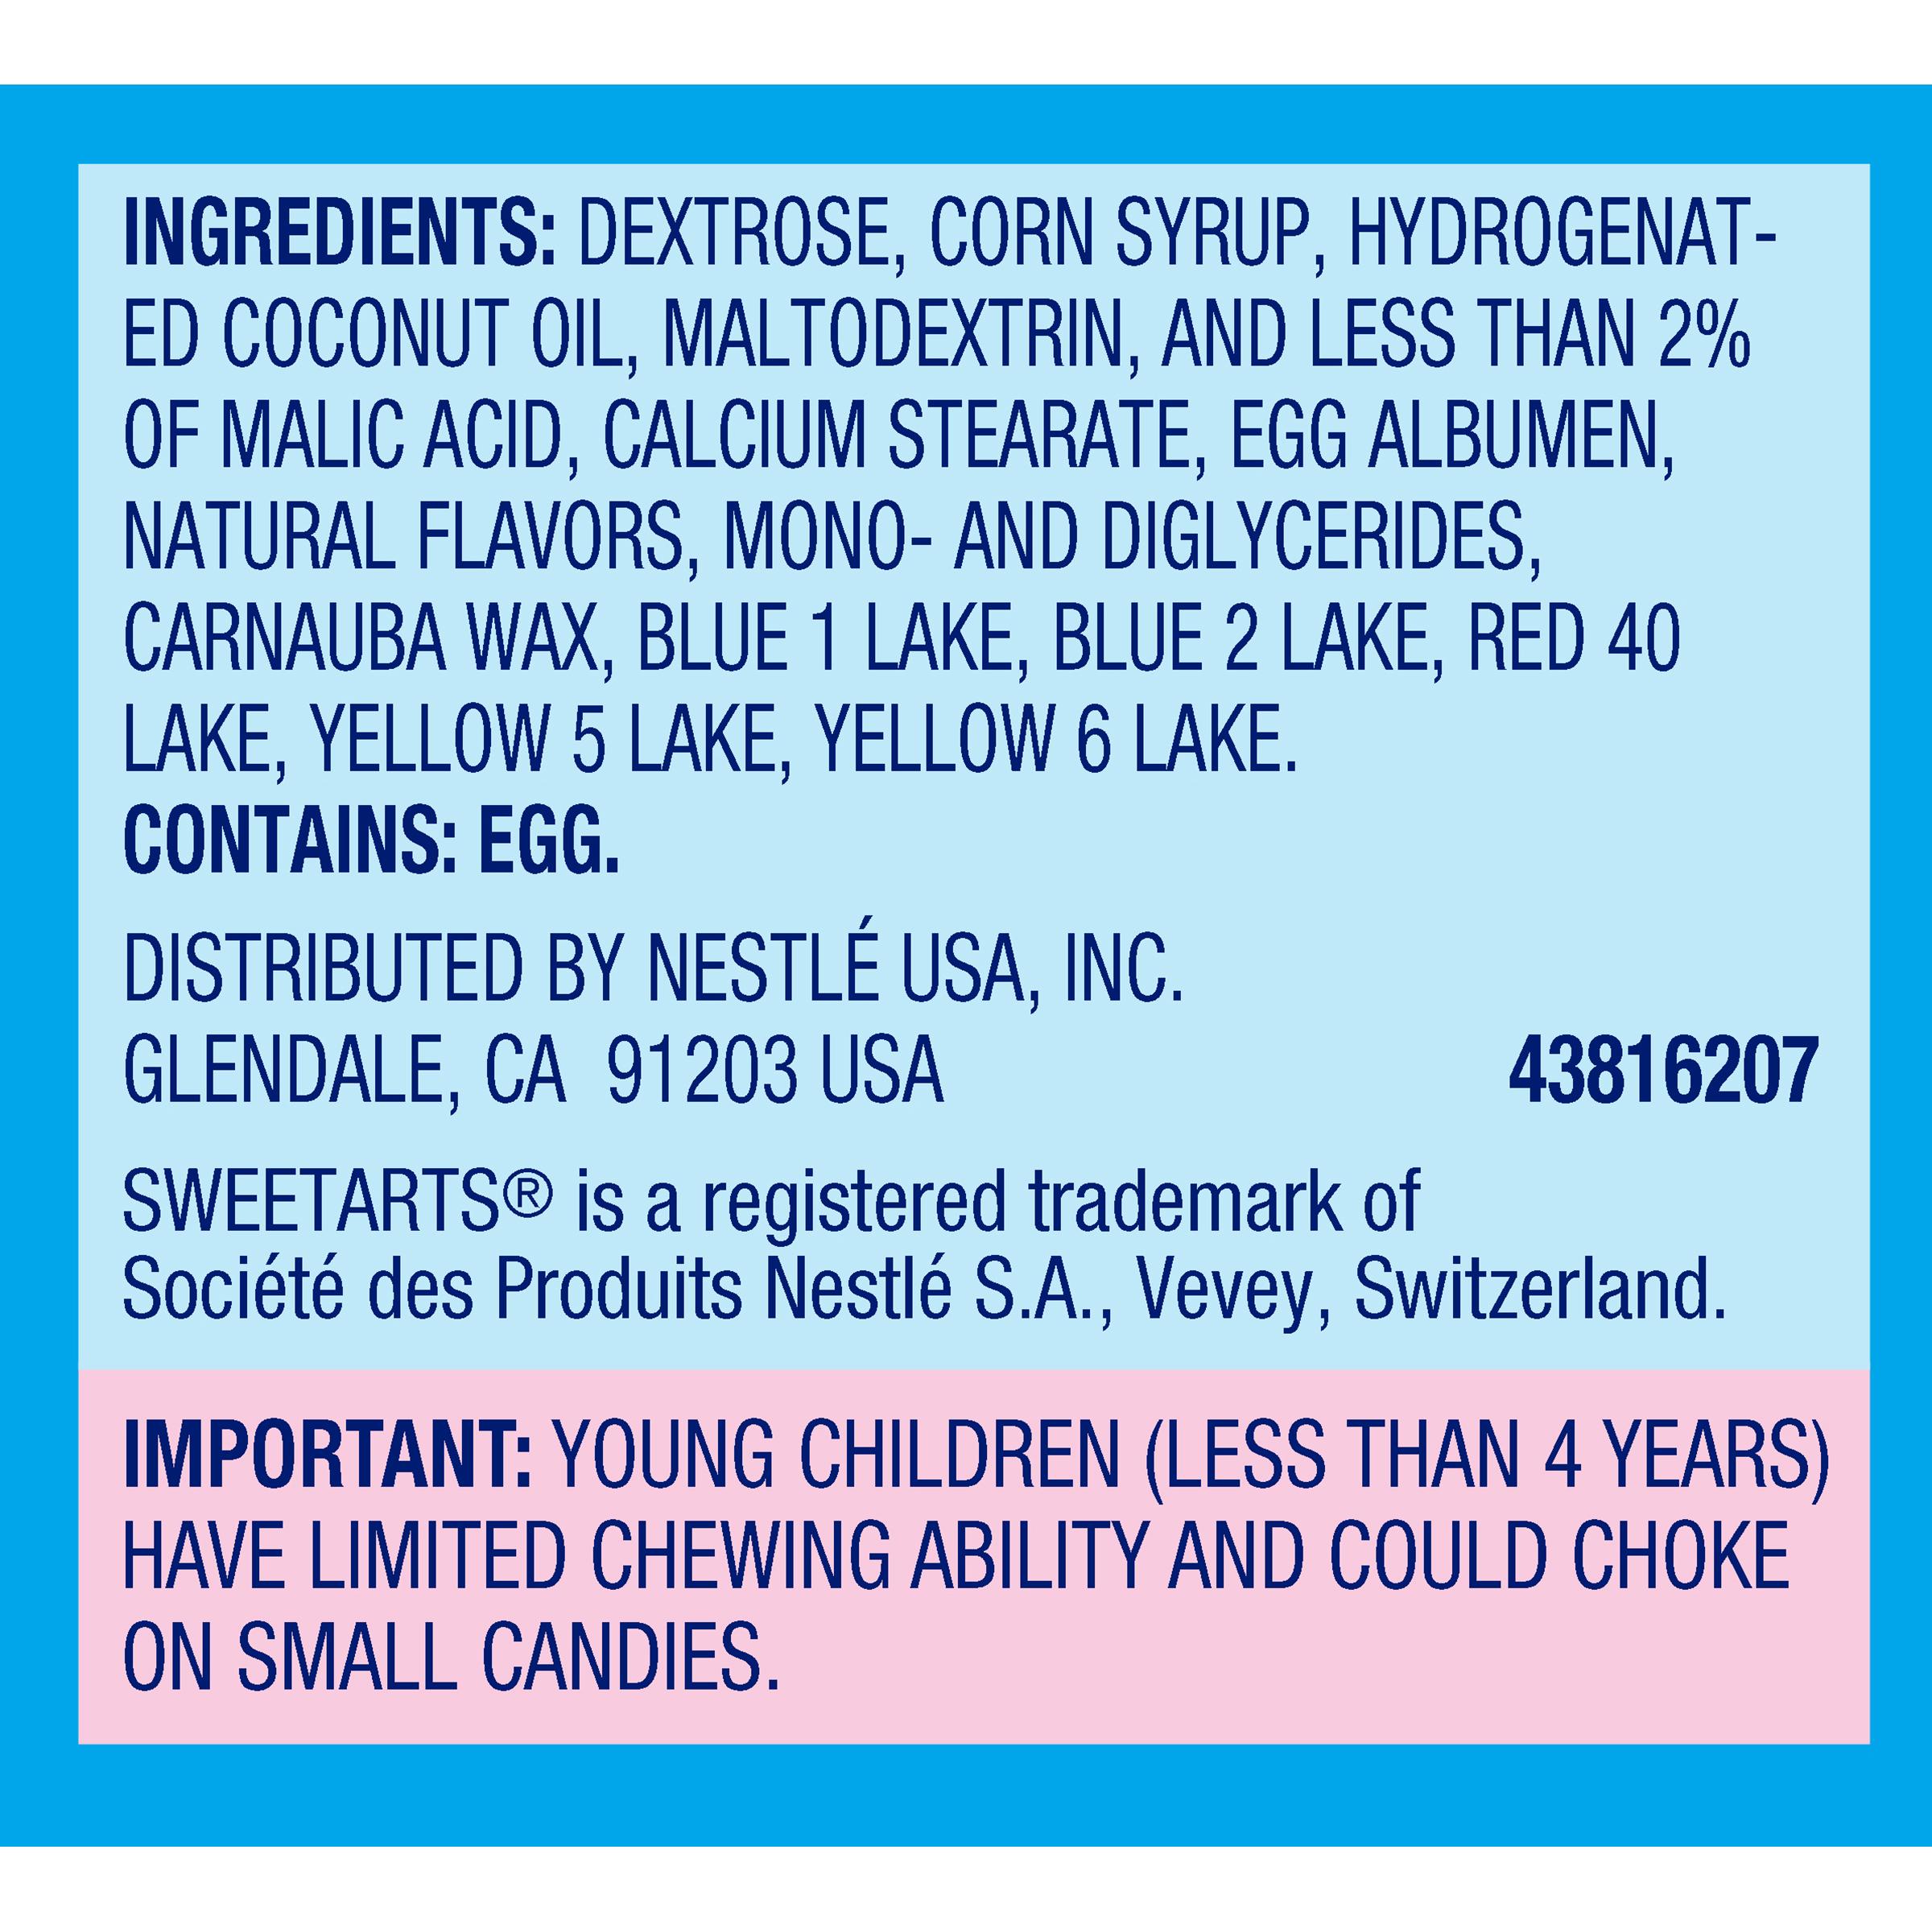 SWEETARTS Mini Chewy Candy 6 oz. Bag - Walmart.com